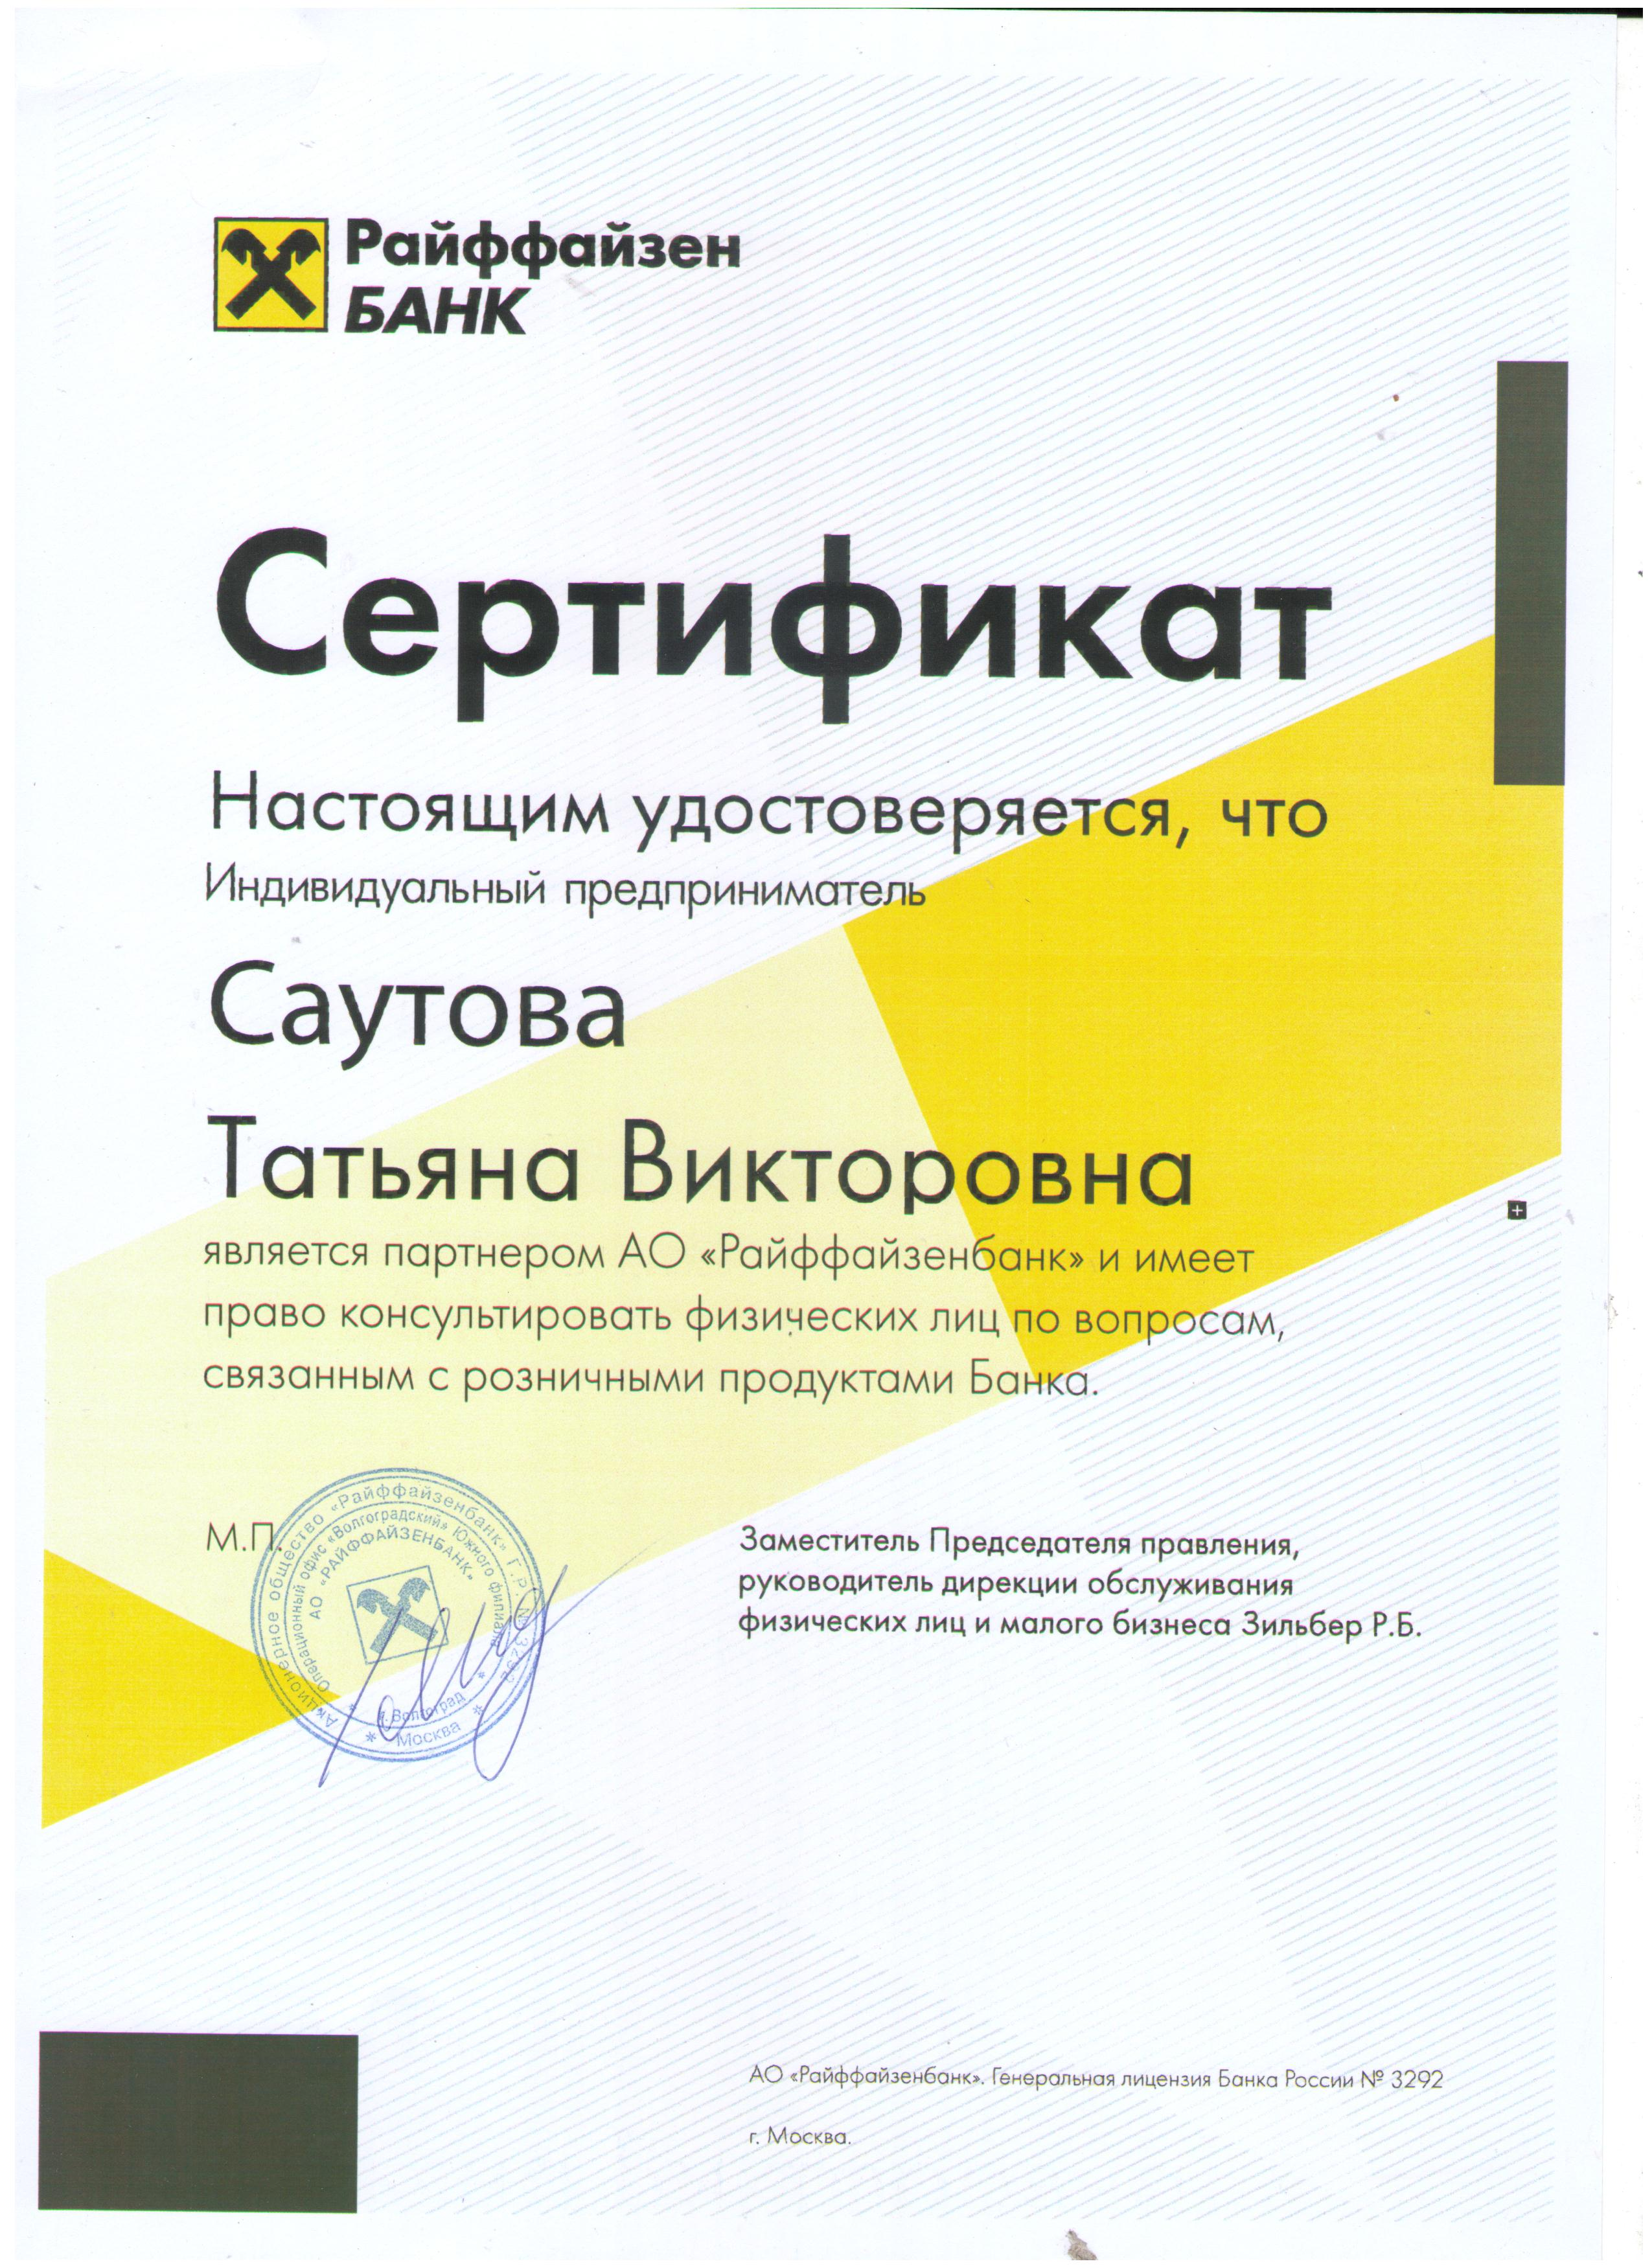 Партнёр Райфазинг